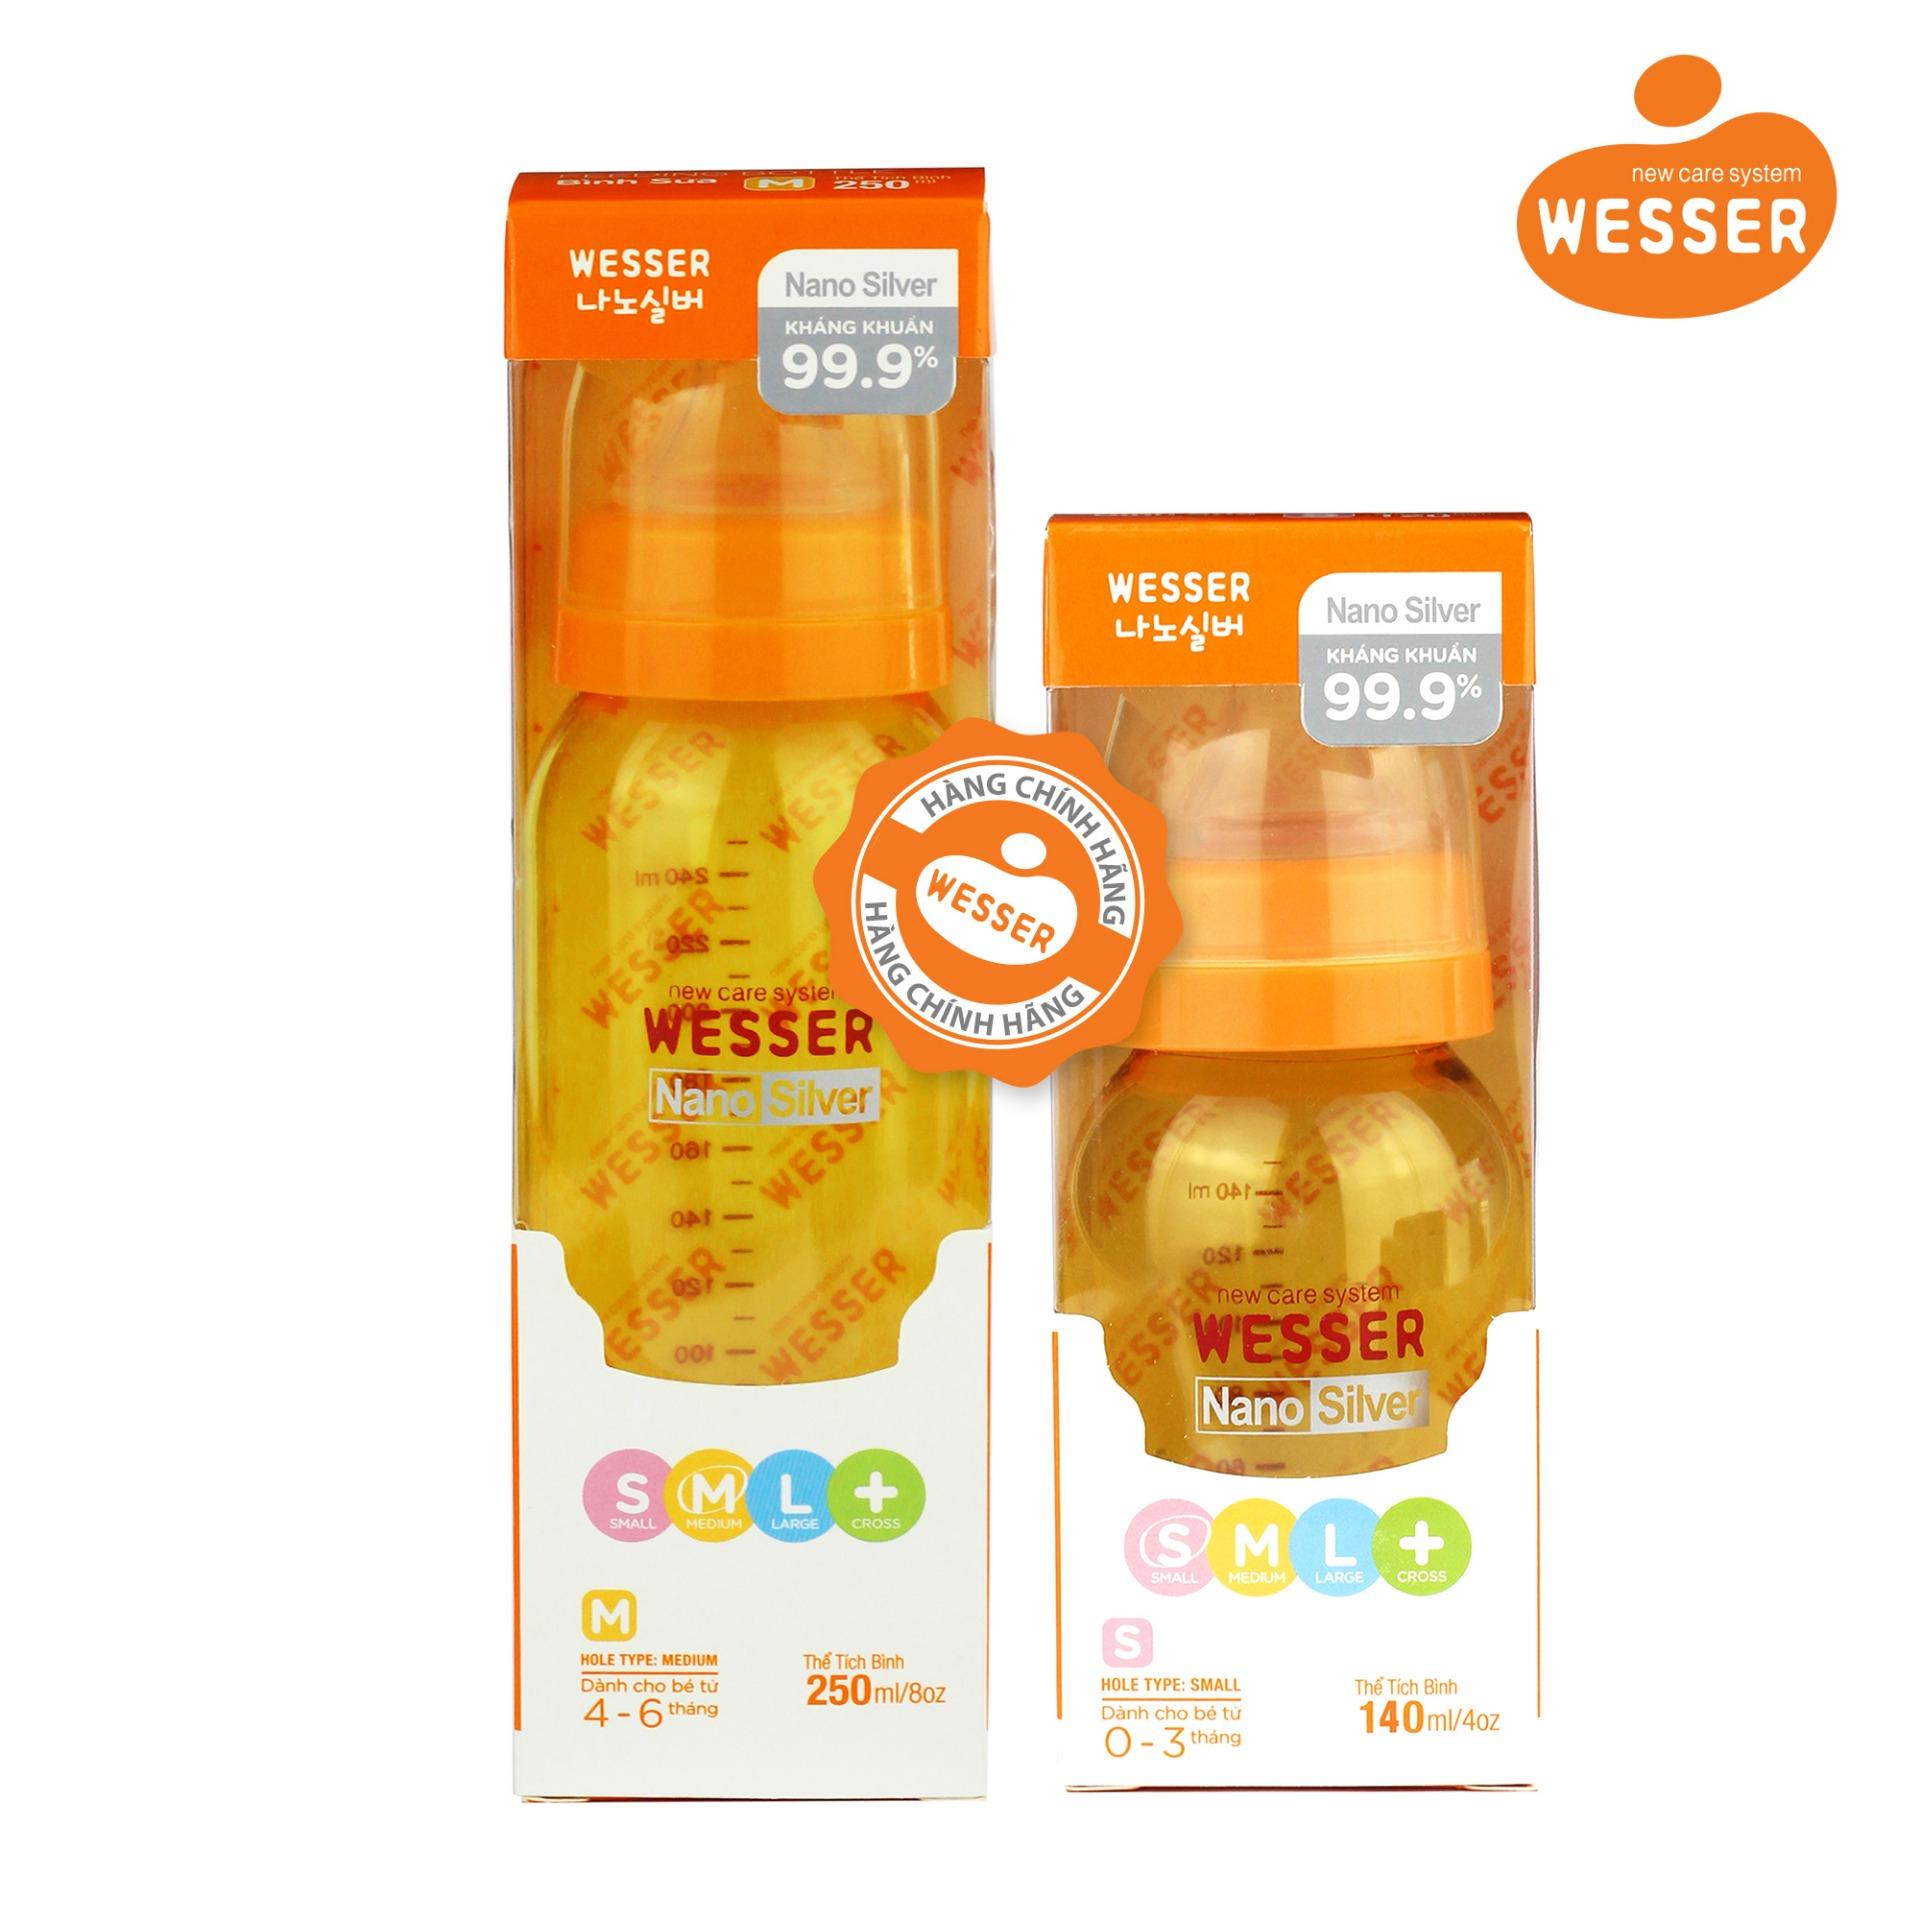 Bộ 2 bình sữa Wesser Nano Silver cổ hẹp 140ml...